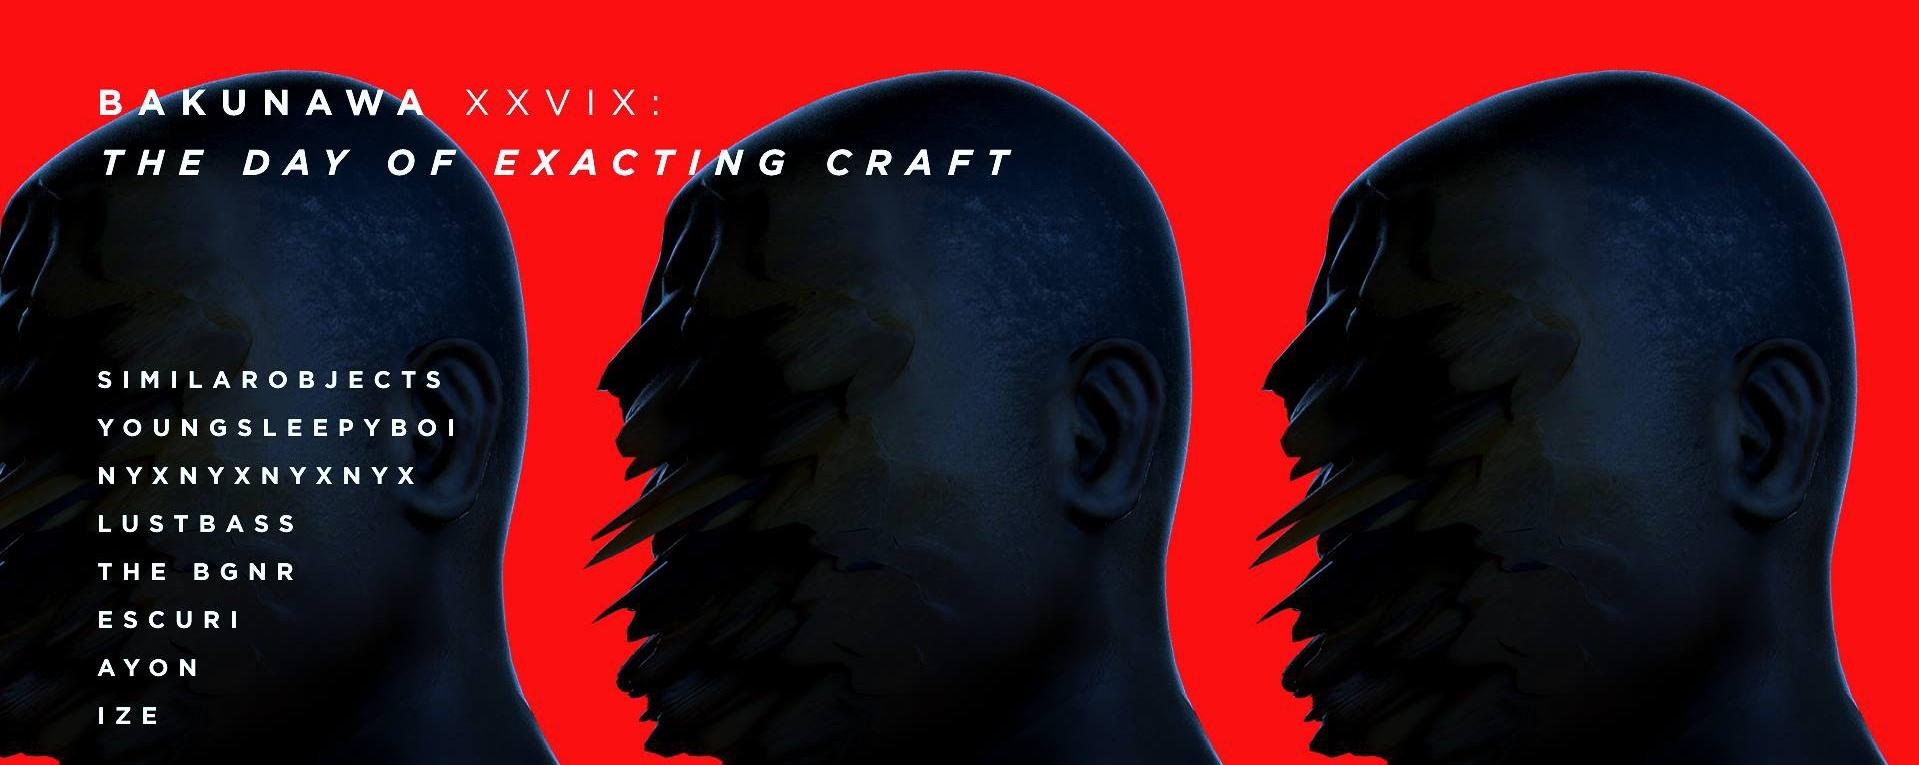 Bakunawa 29 : The Day of Exacting Craft